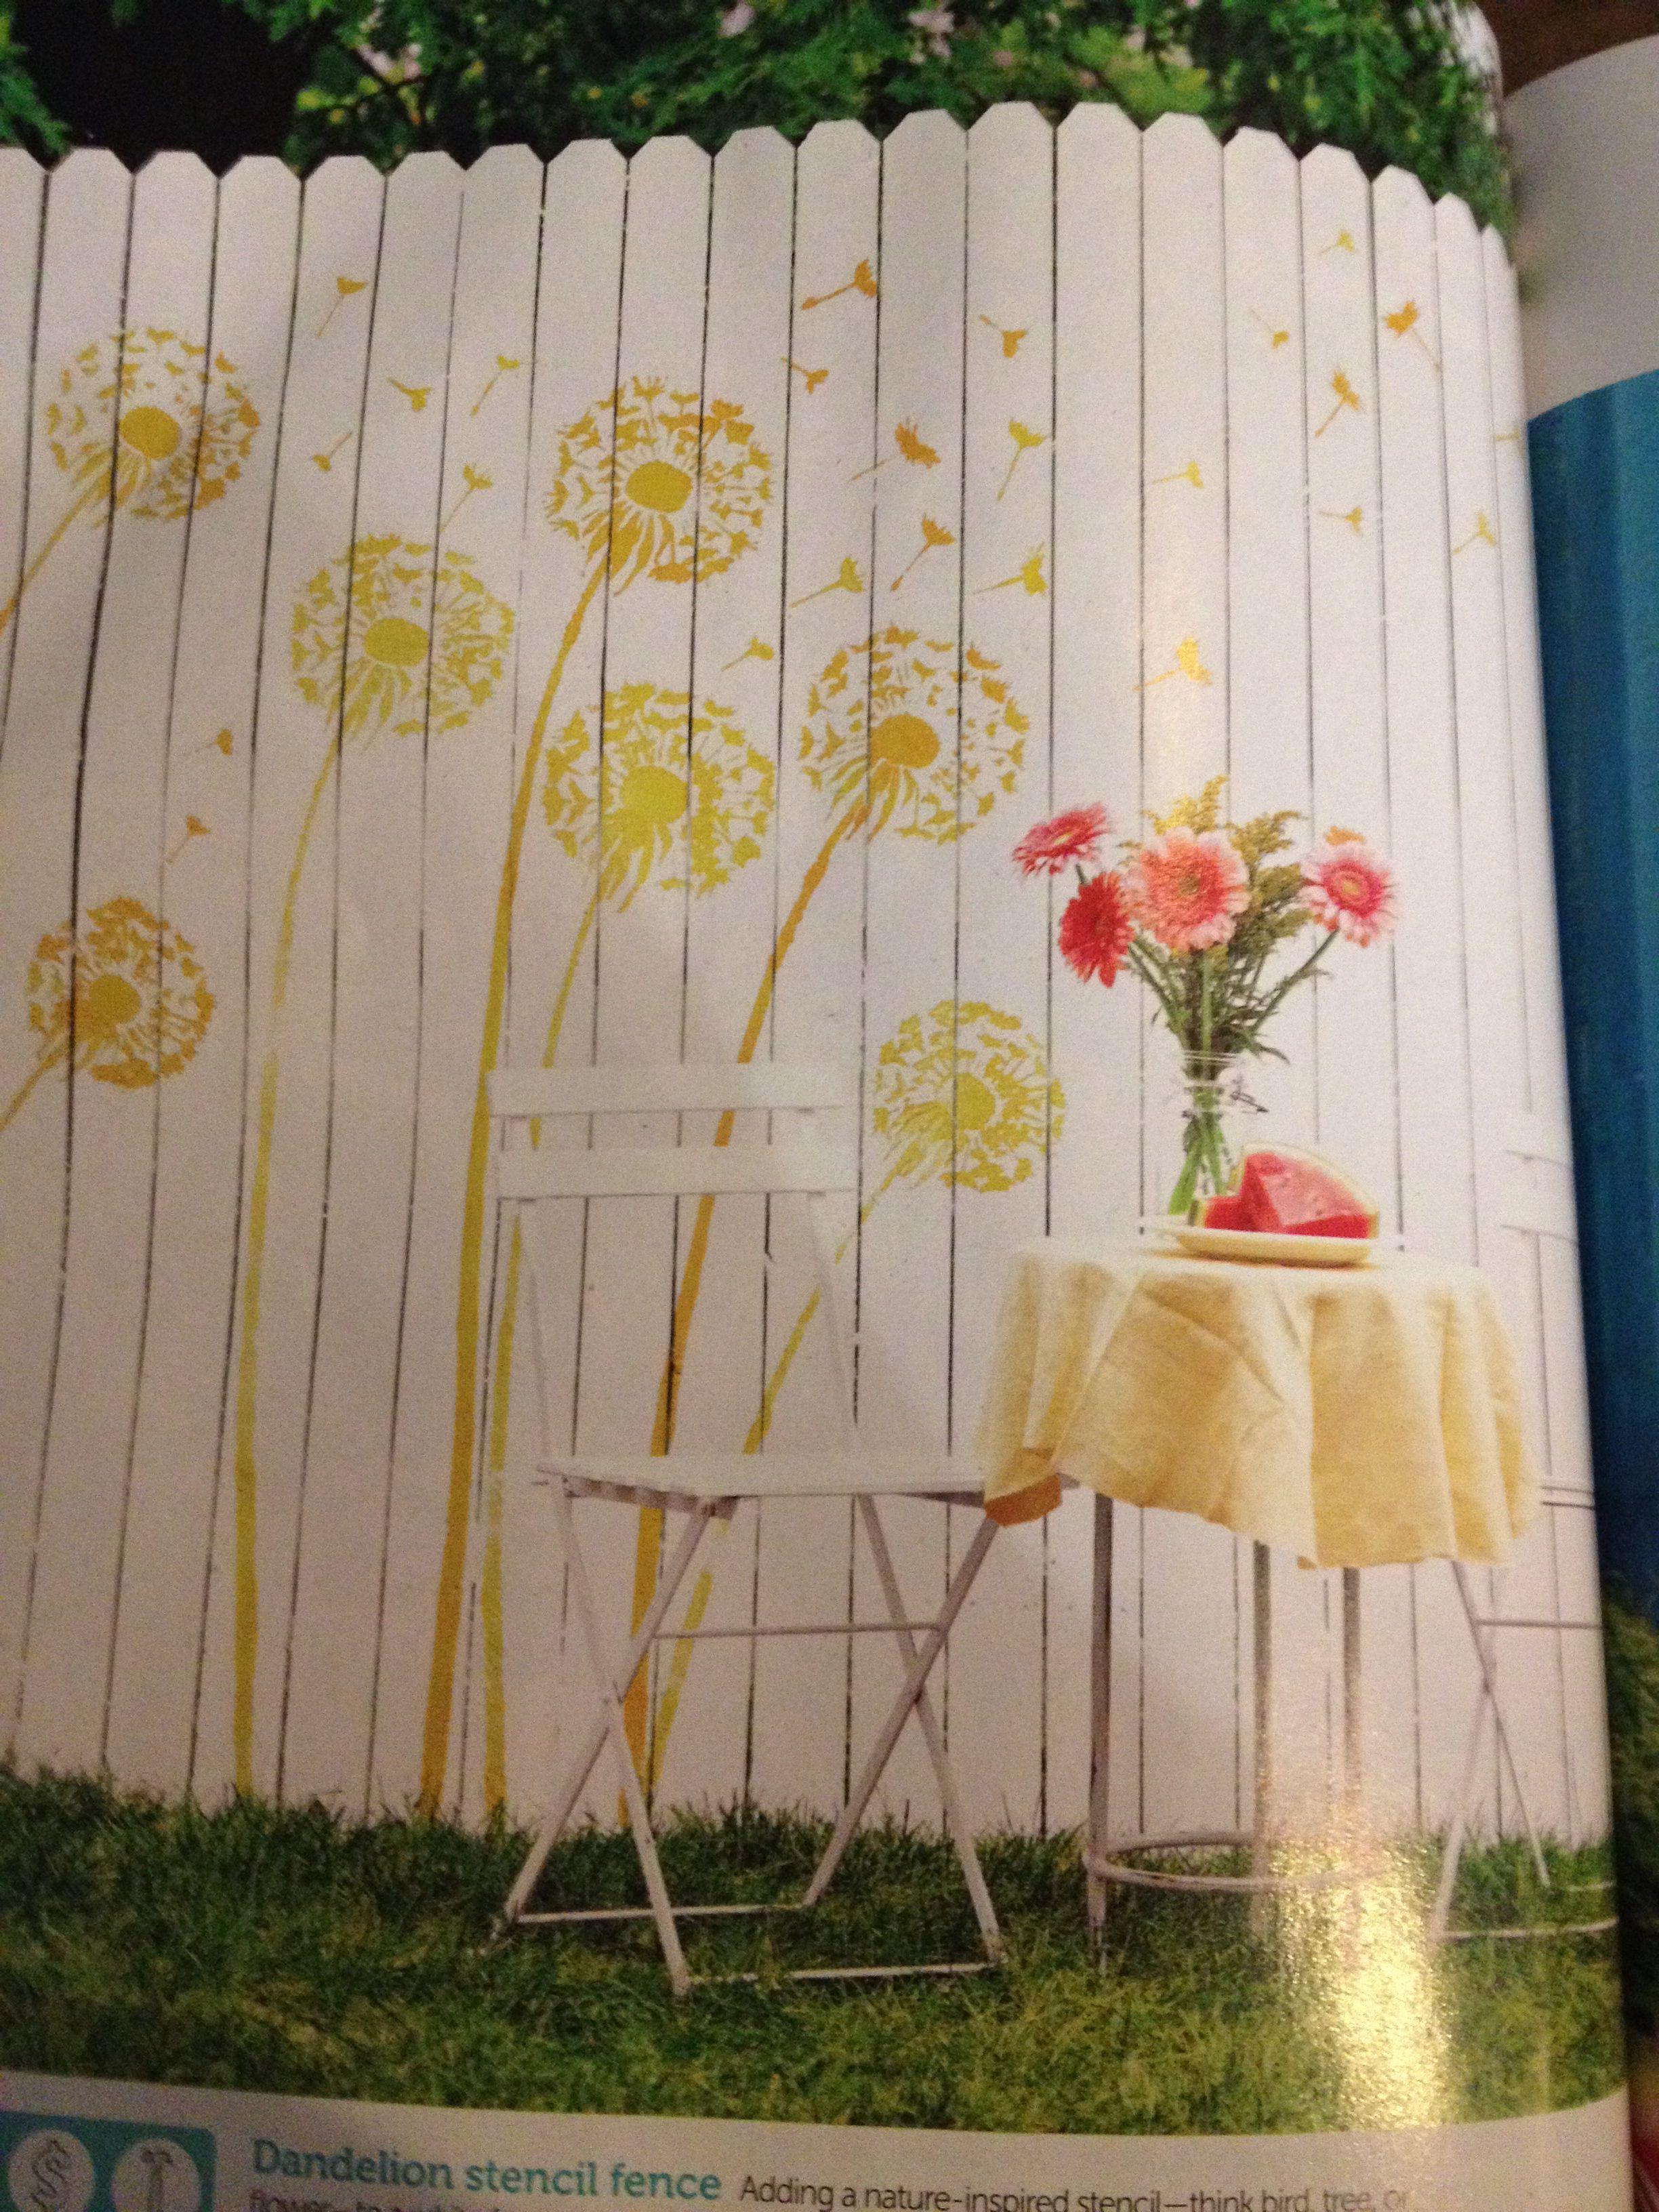 Dandelion stencil fence